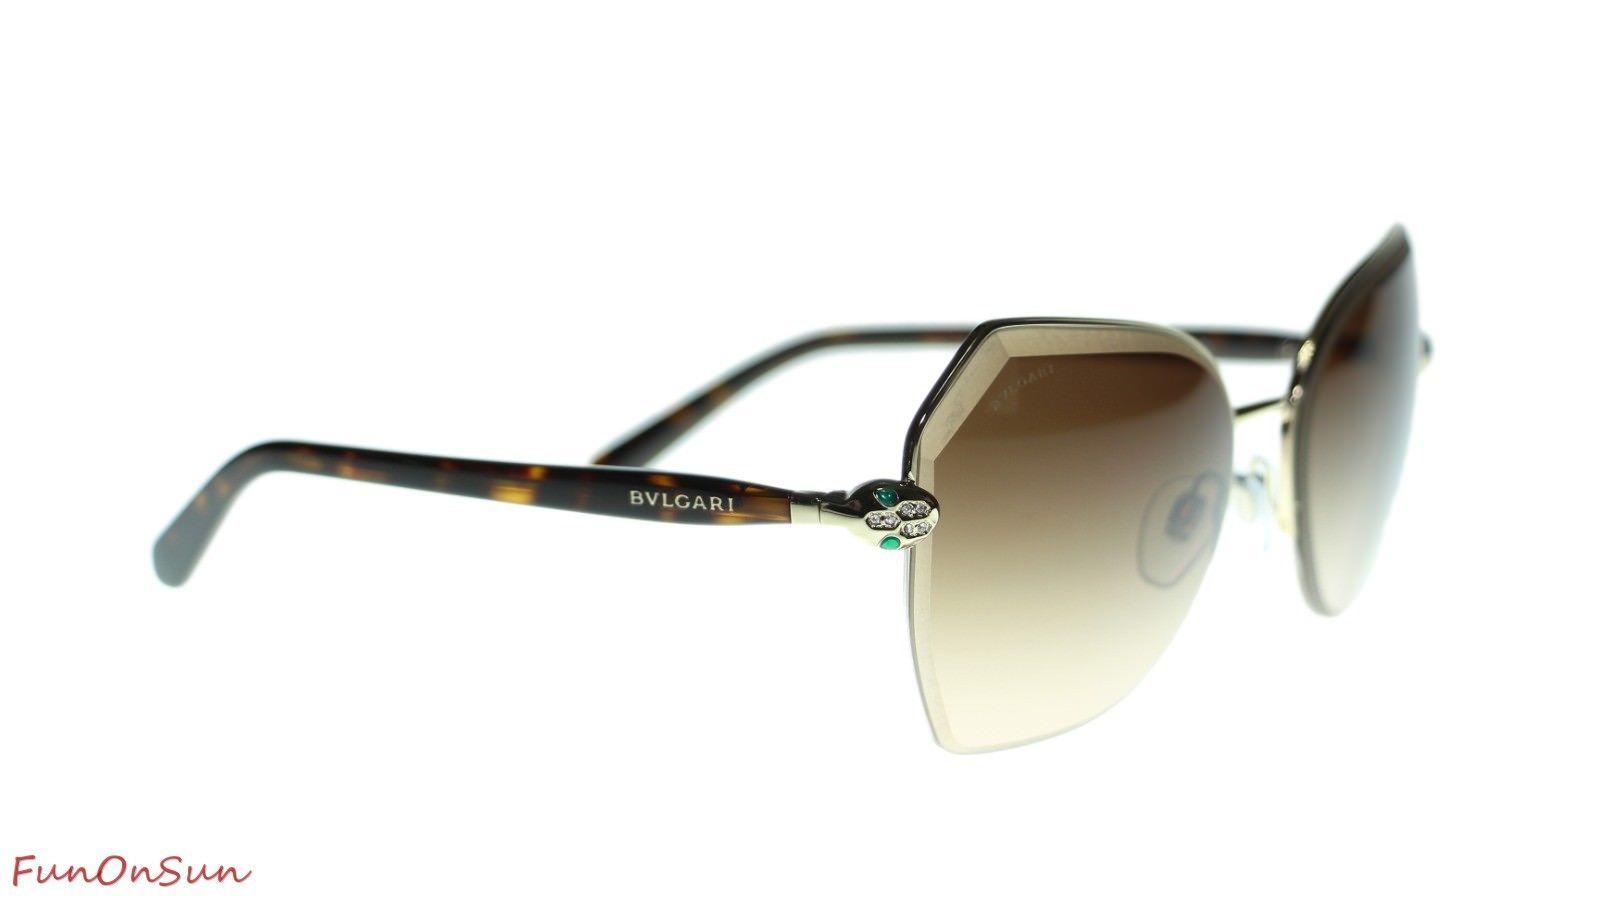 BVLGARI Women's Irregular Sunglasses BV6102B 201318 Pale Gold/Brown Lens 59mm